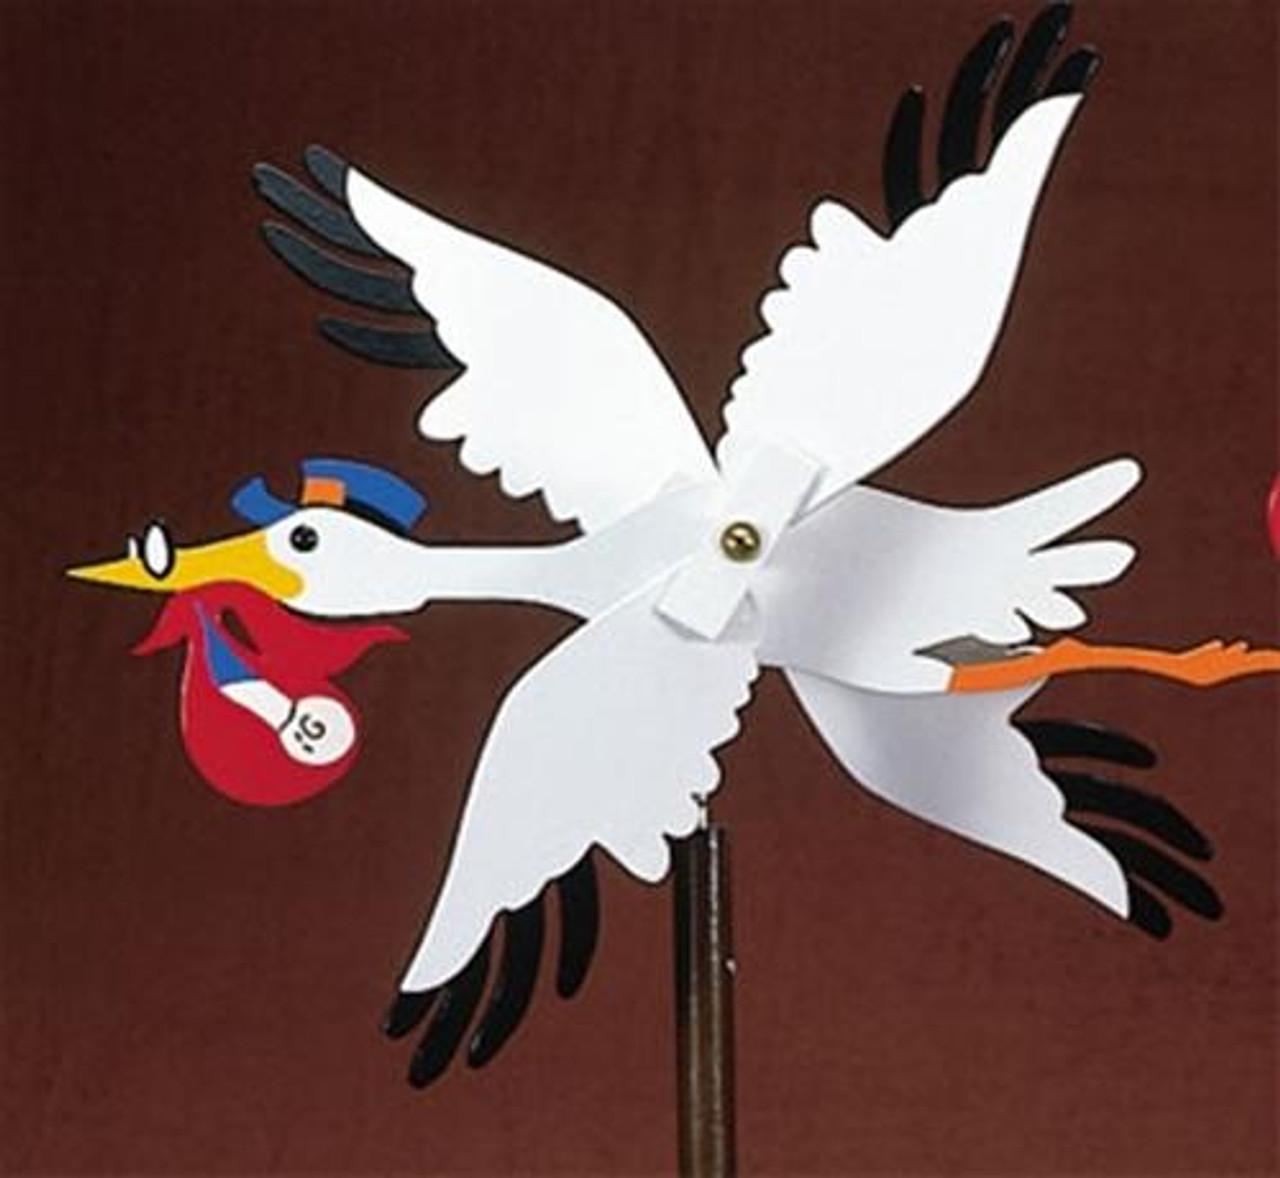 Cherry Tree Toys Stork Whirligig Plan